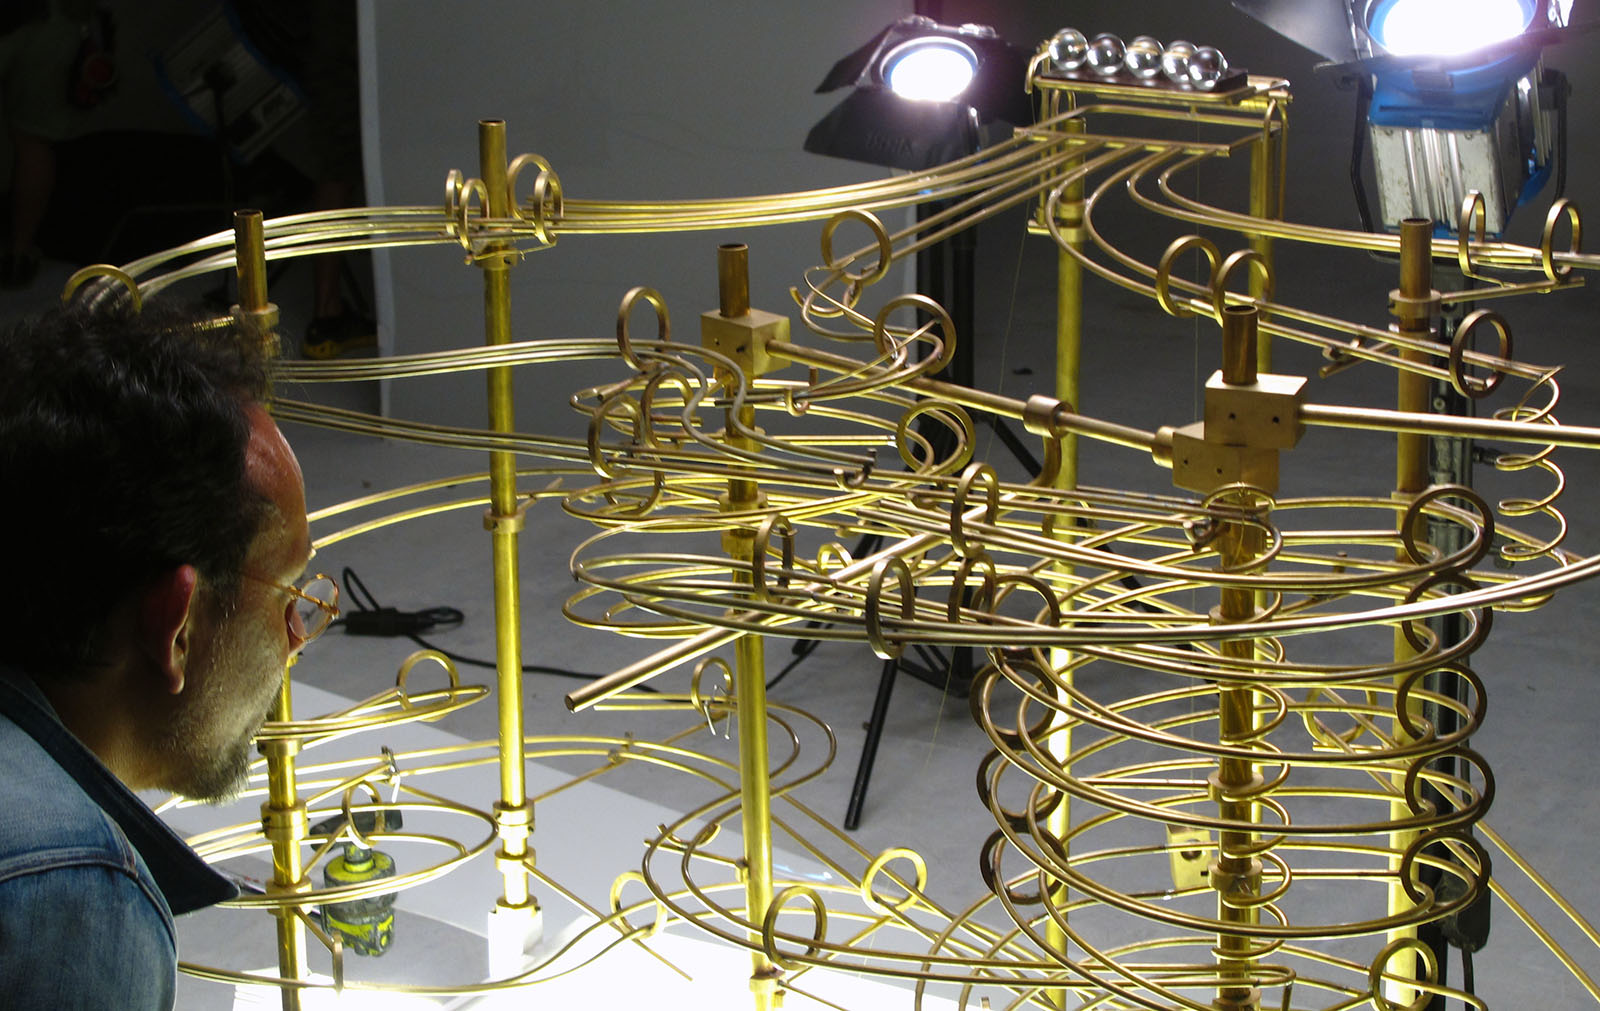 Close-up detail of the Maybank 'Rube Goldberg' machine